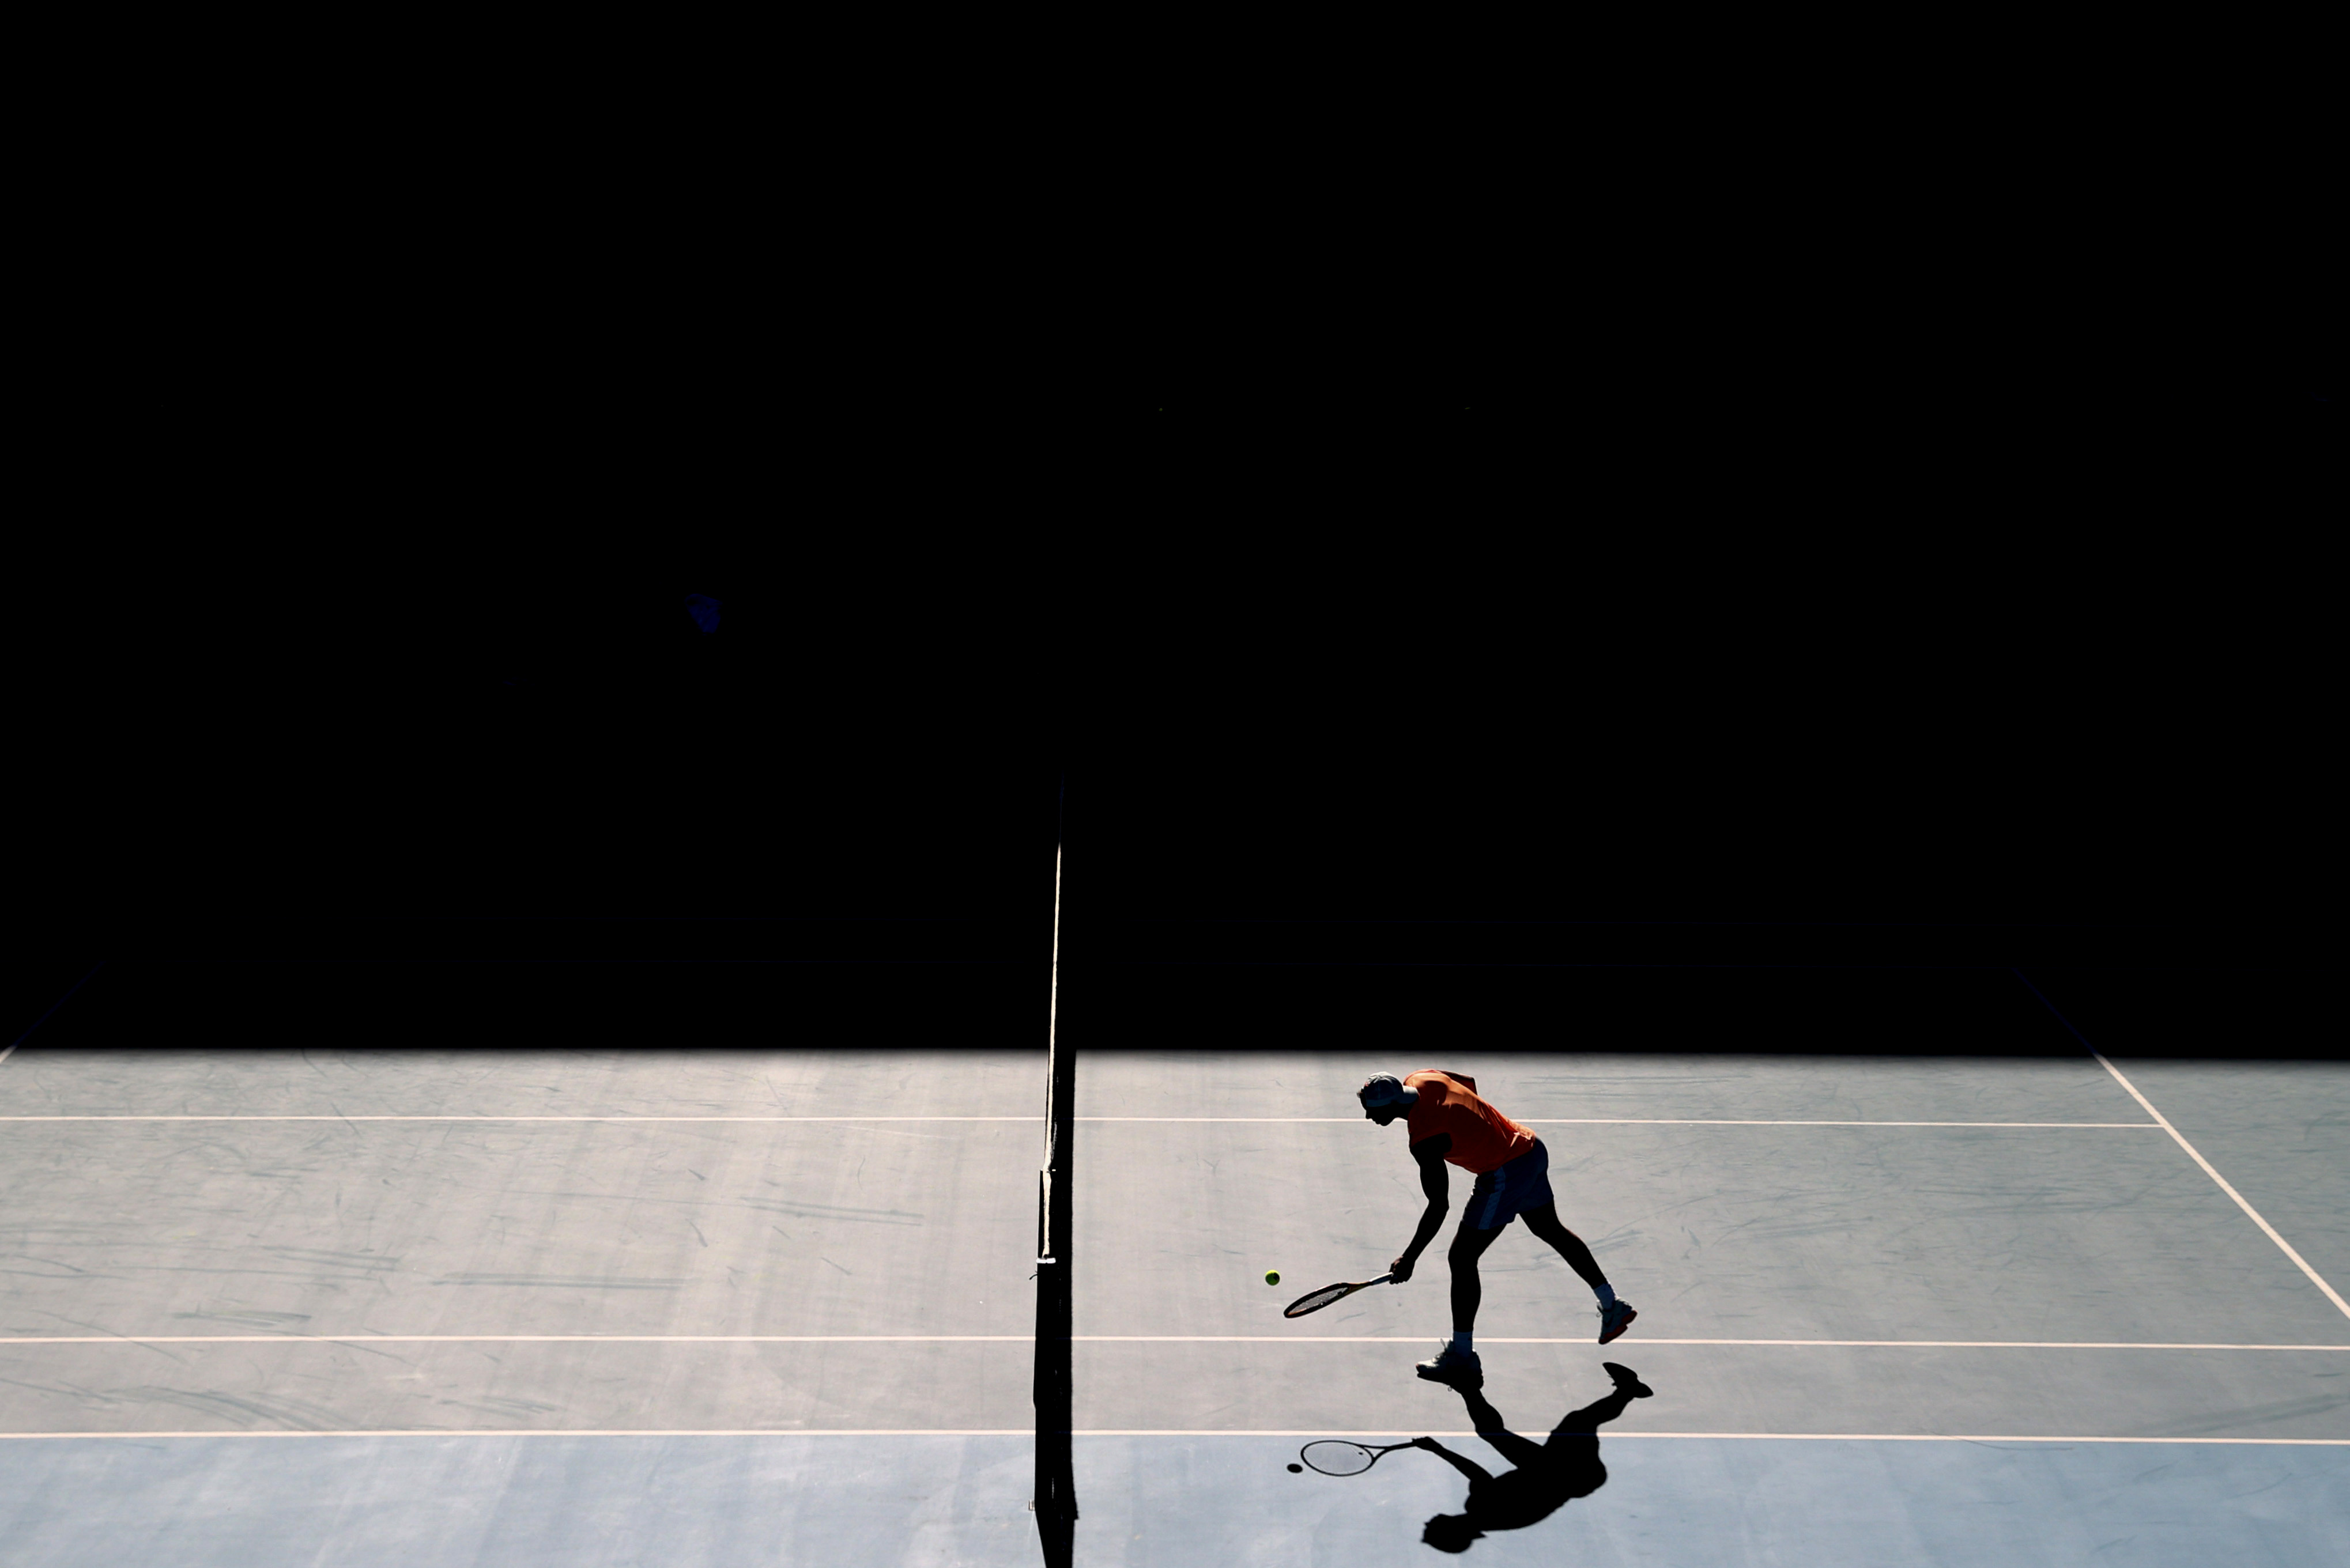 Tennis star Rafael Nadal of Spain practices at Melbourne Park in advance of the Australian Open in Melbourne, Australia, January 31, 2021. REUTERS/Loren Elliott